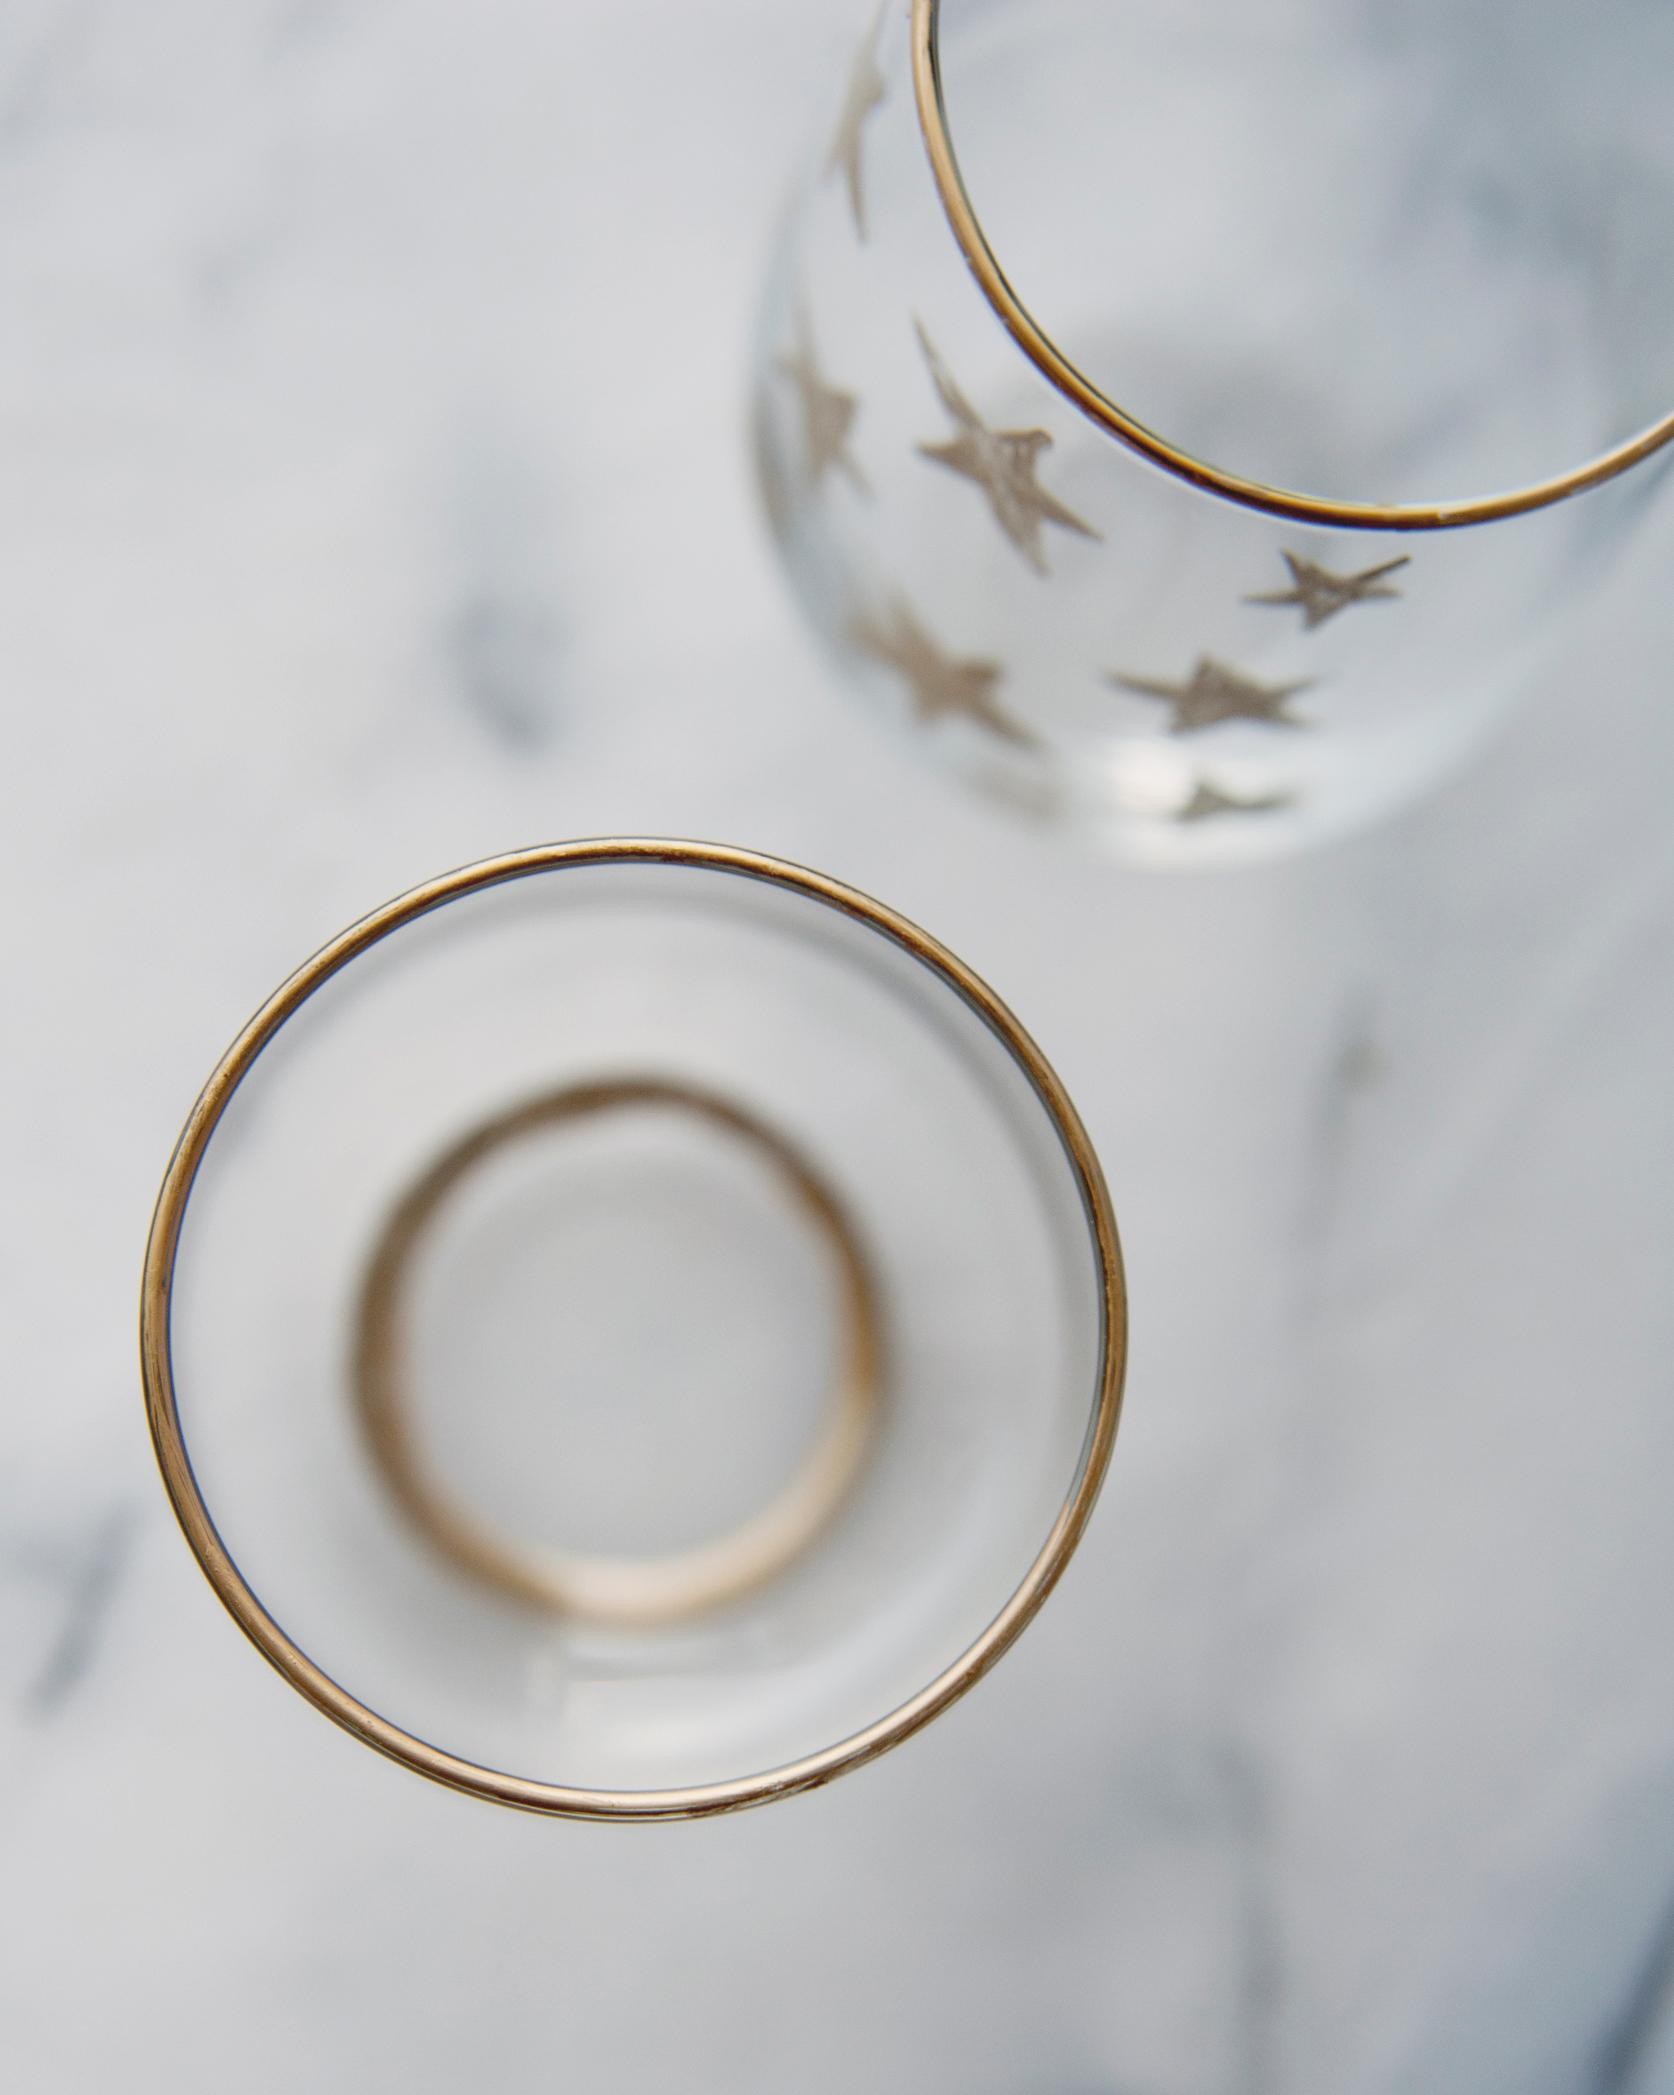 claire-thomas-bridal-shower-vintage-diy-finished-glasses-top-0814.jpg